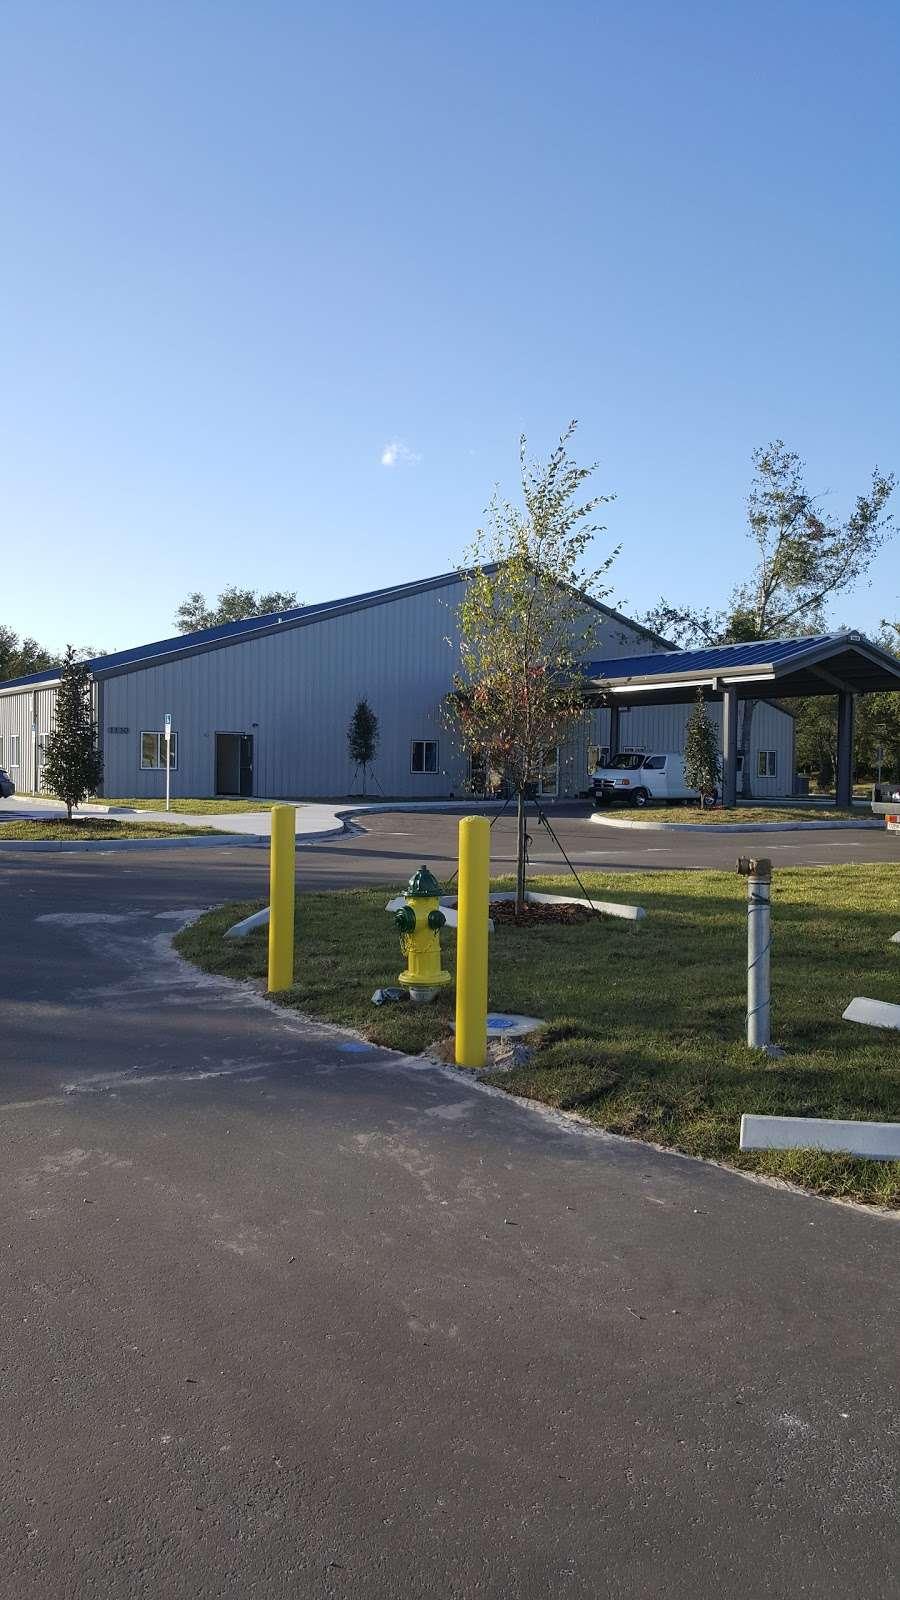 Centro Cristiano Dios De Pactos Florida - church  | Photo 8 of 10 | Address: 1130 Simmons Rd, Kissimmee, FL 34744, USA | Phone: (407) 870-5858